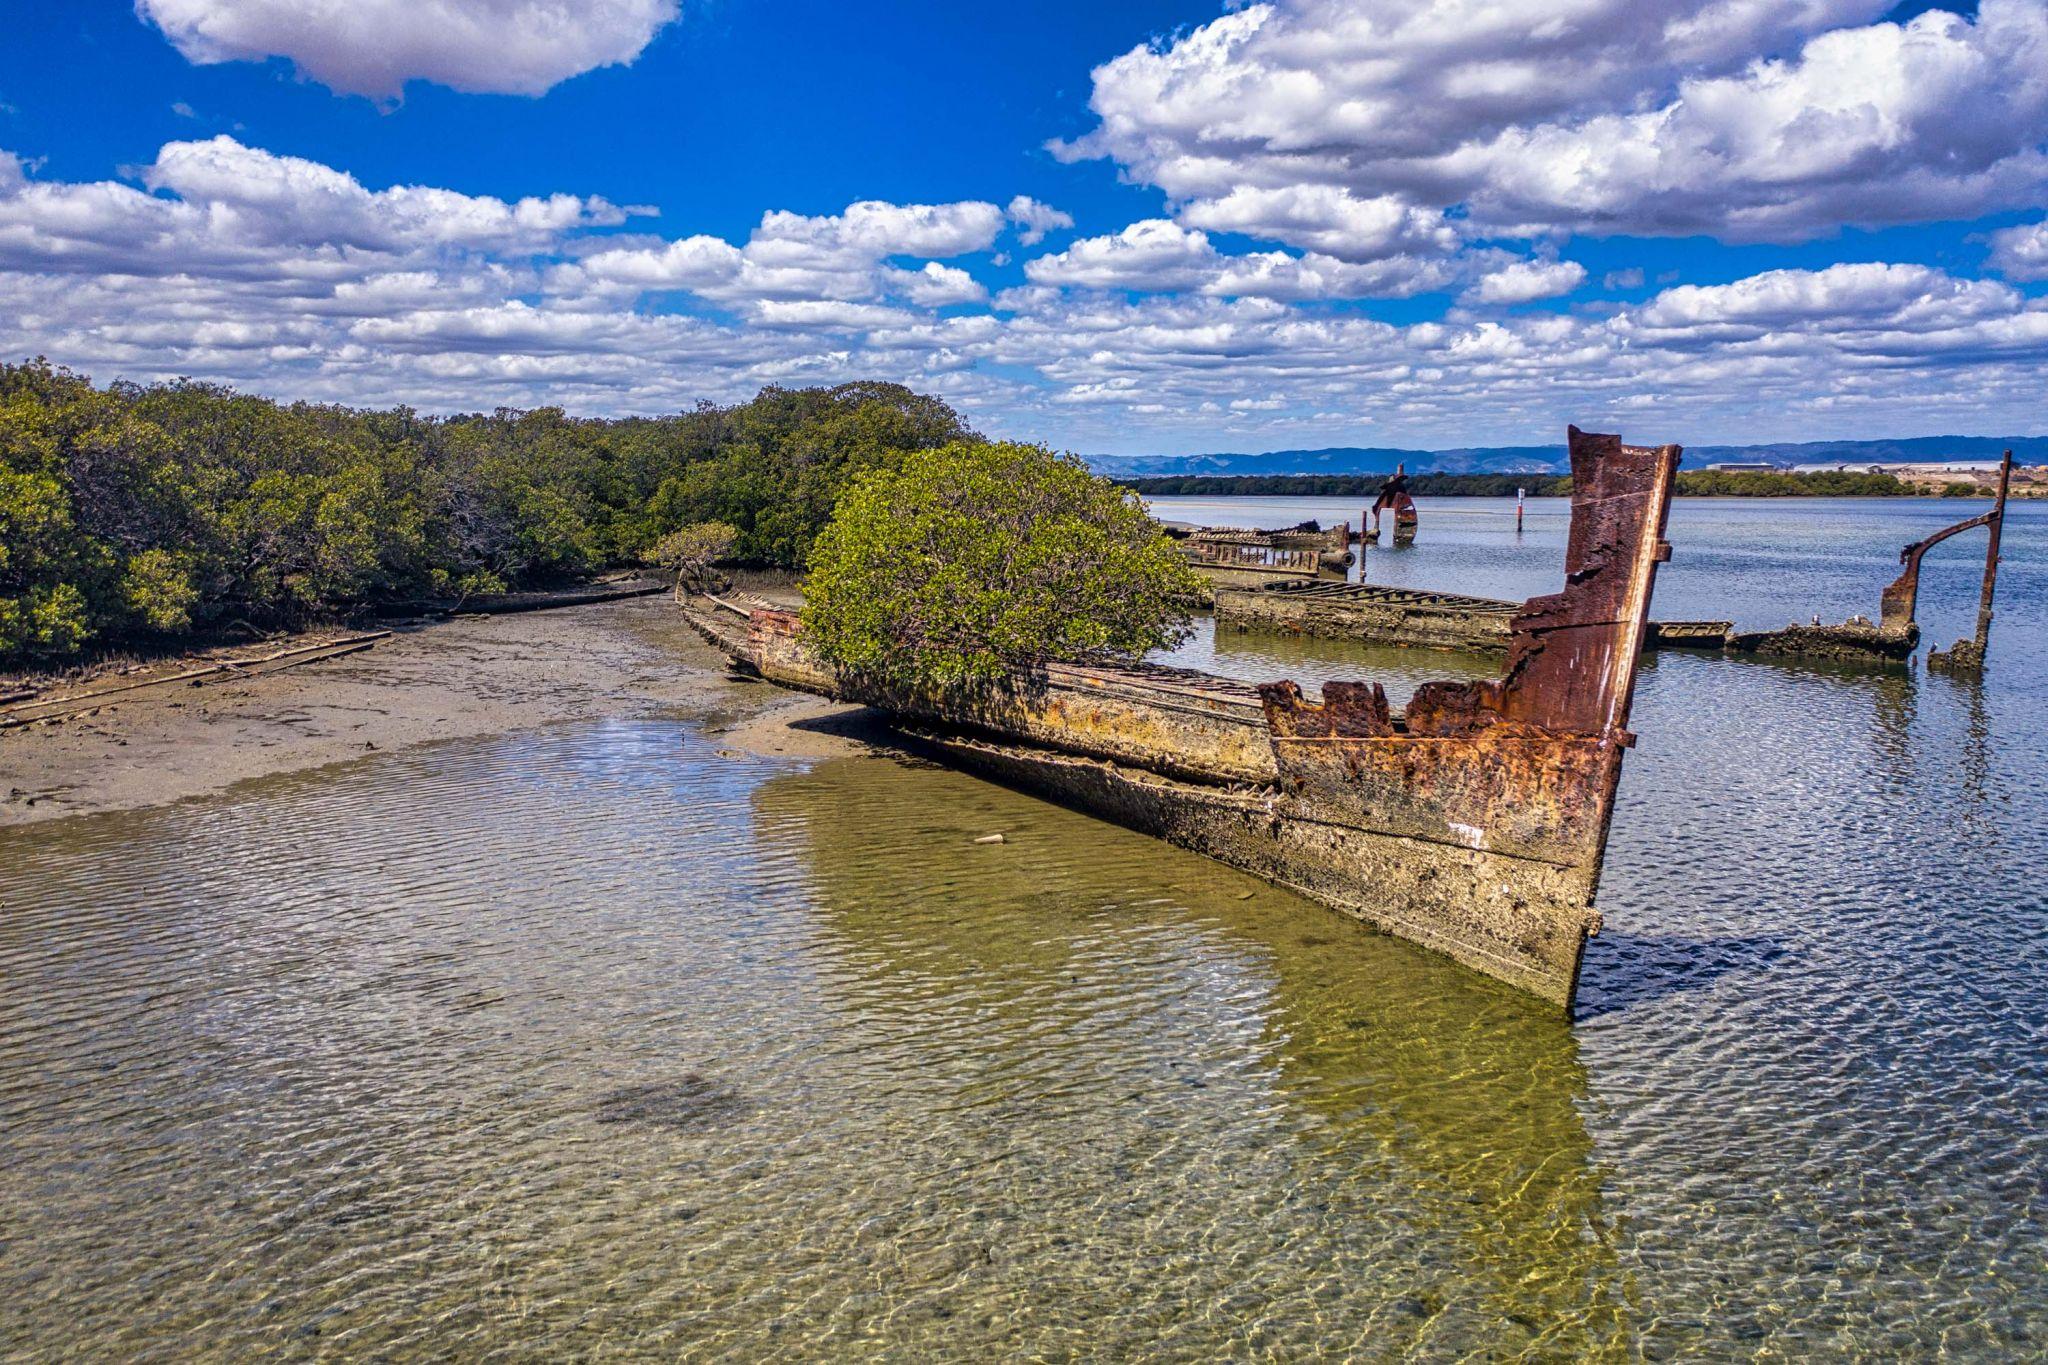 Garden Island, shipwrecks, Port Adelaide, South Australia, Australia